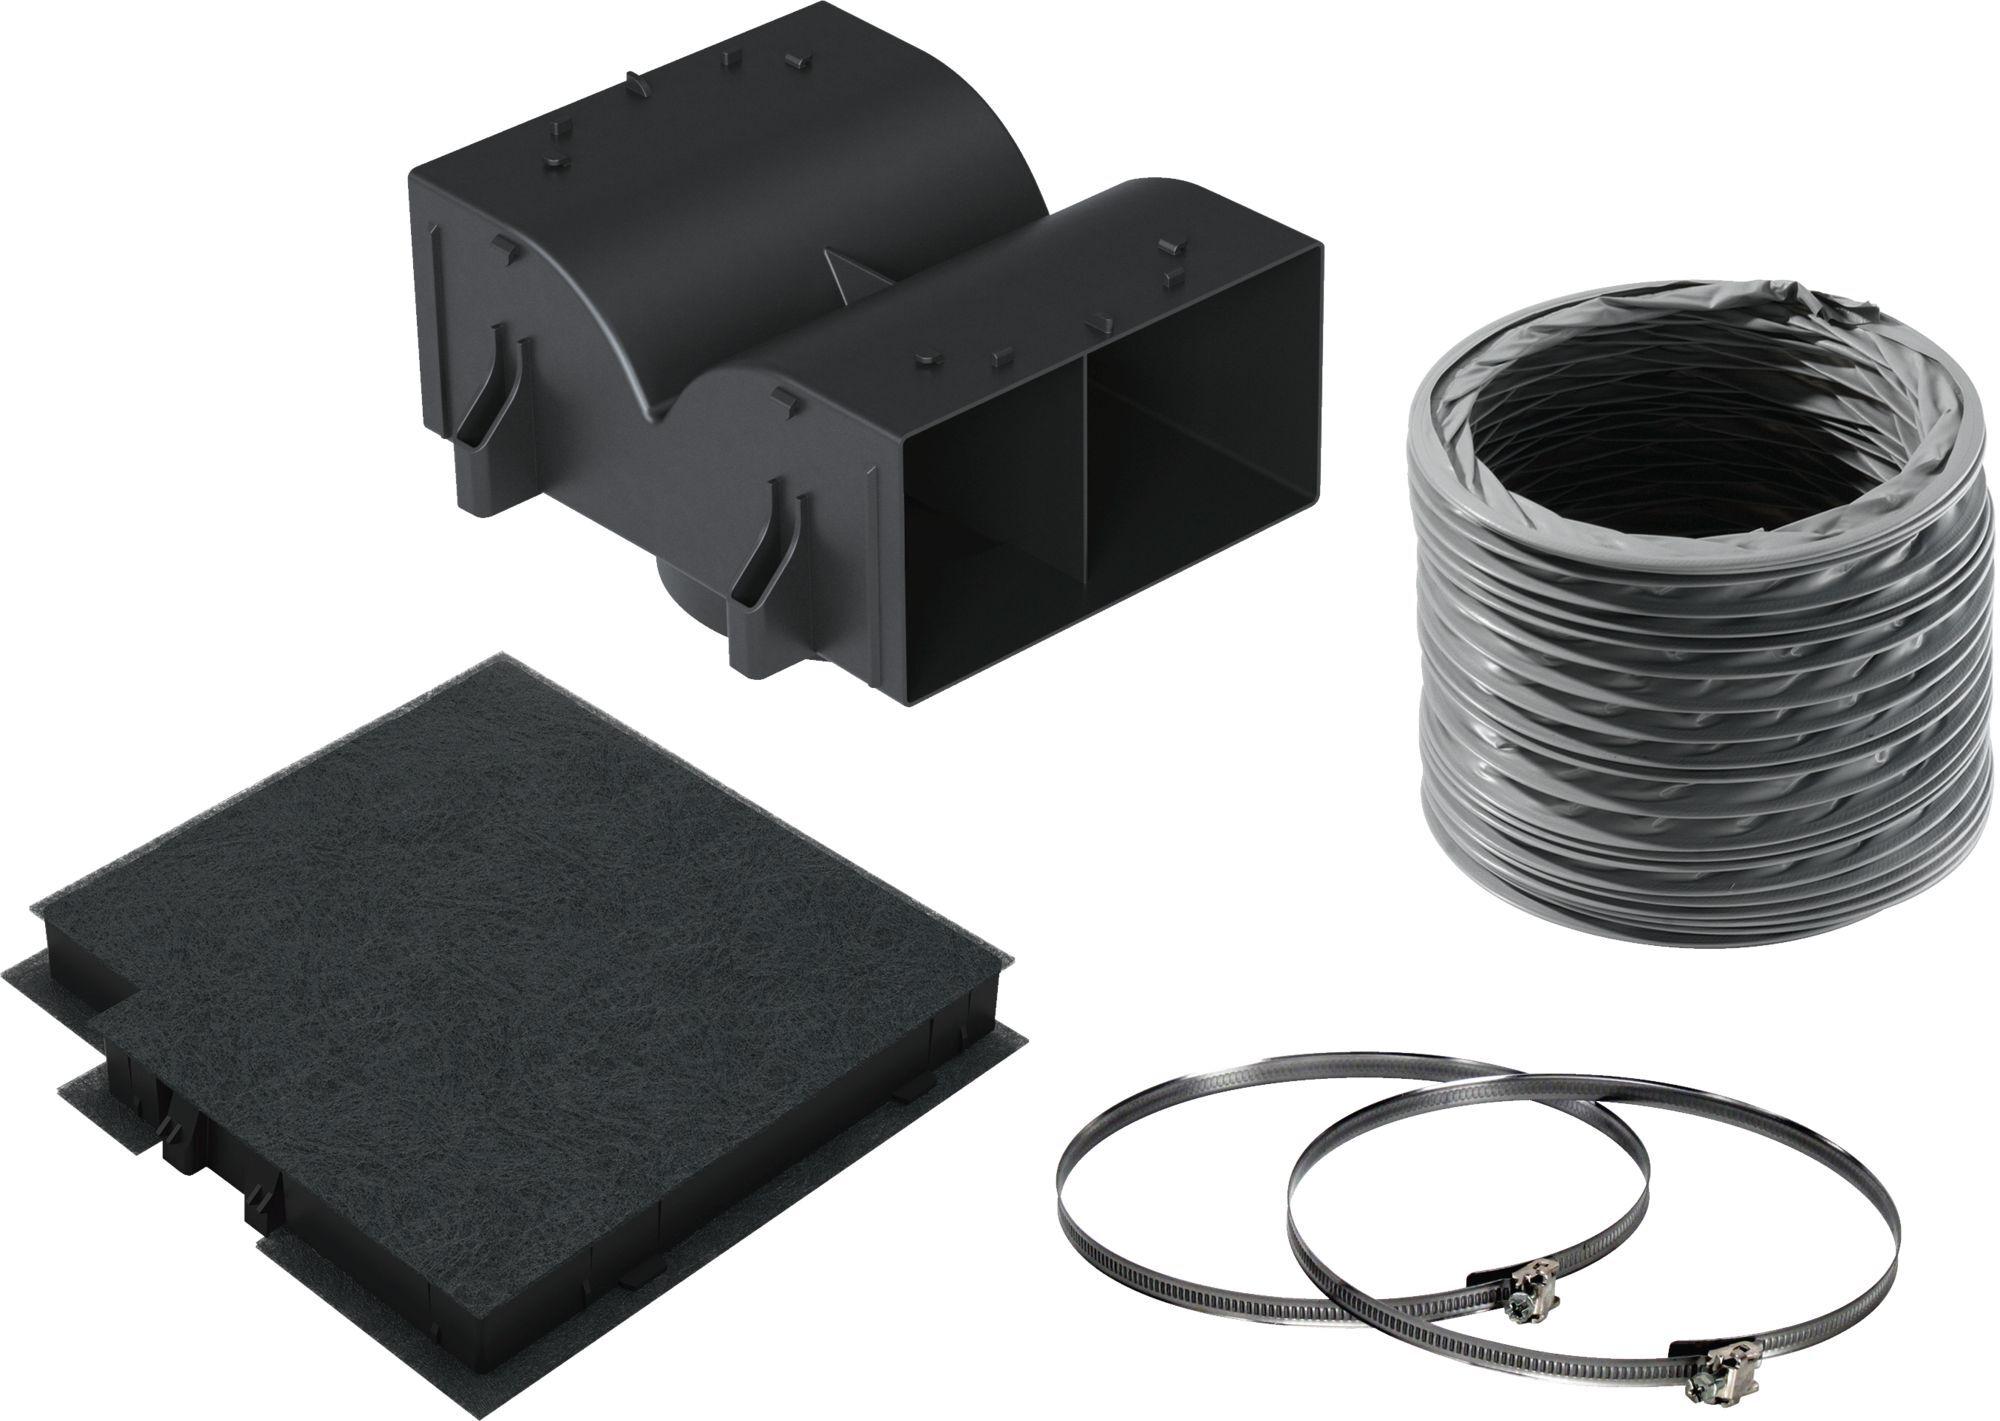 Siemens LZ10DXU00 Recirculating Kit